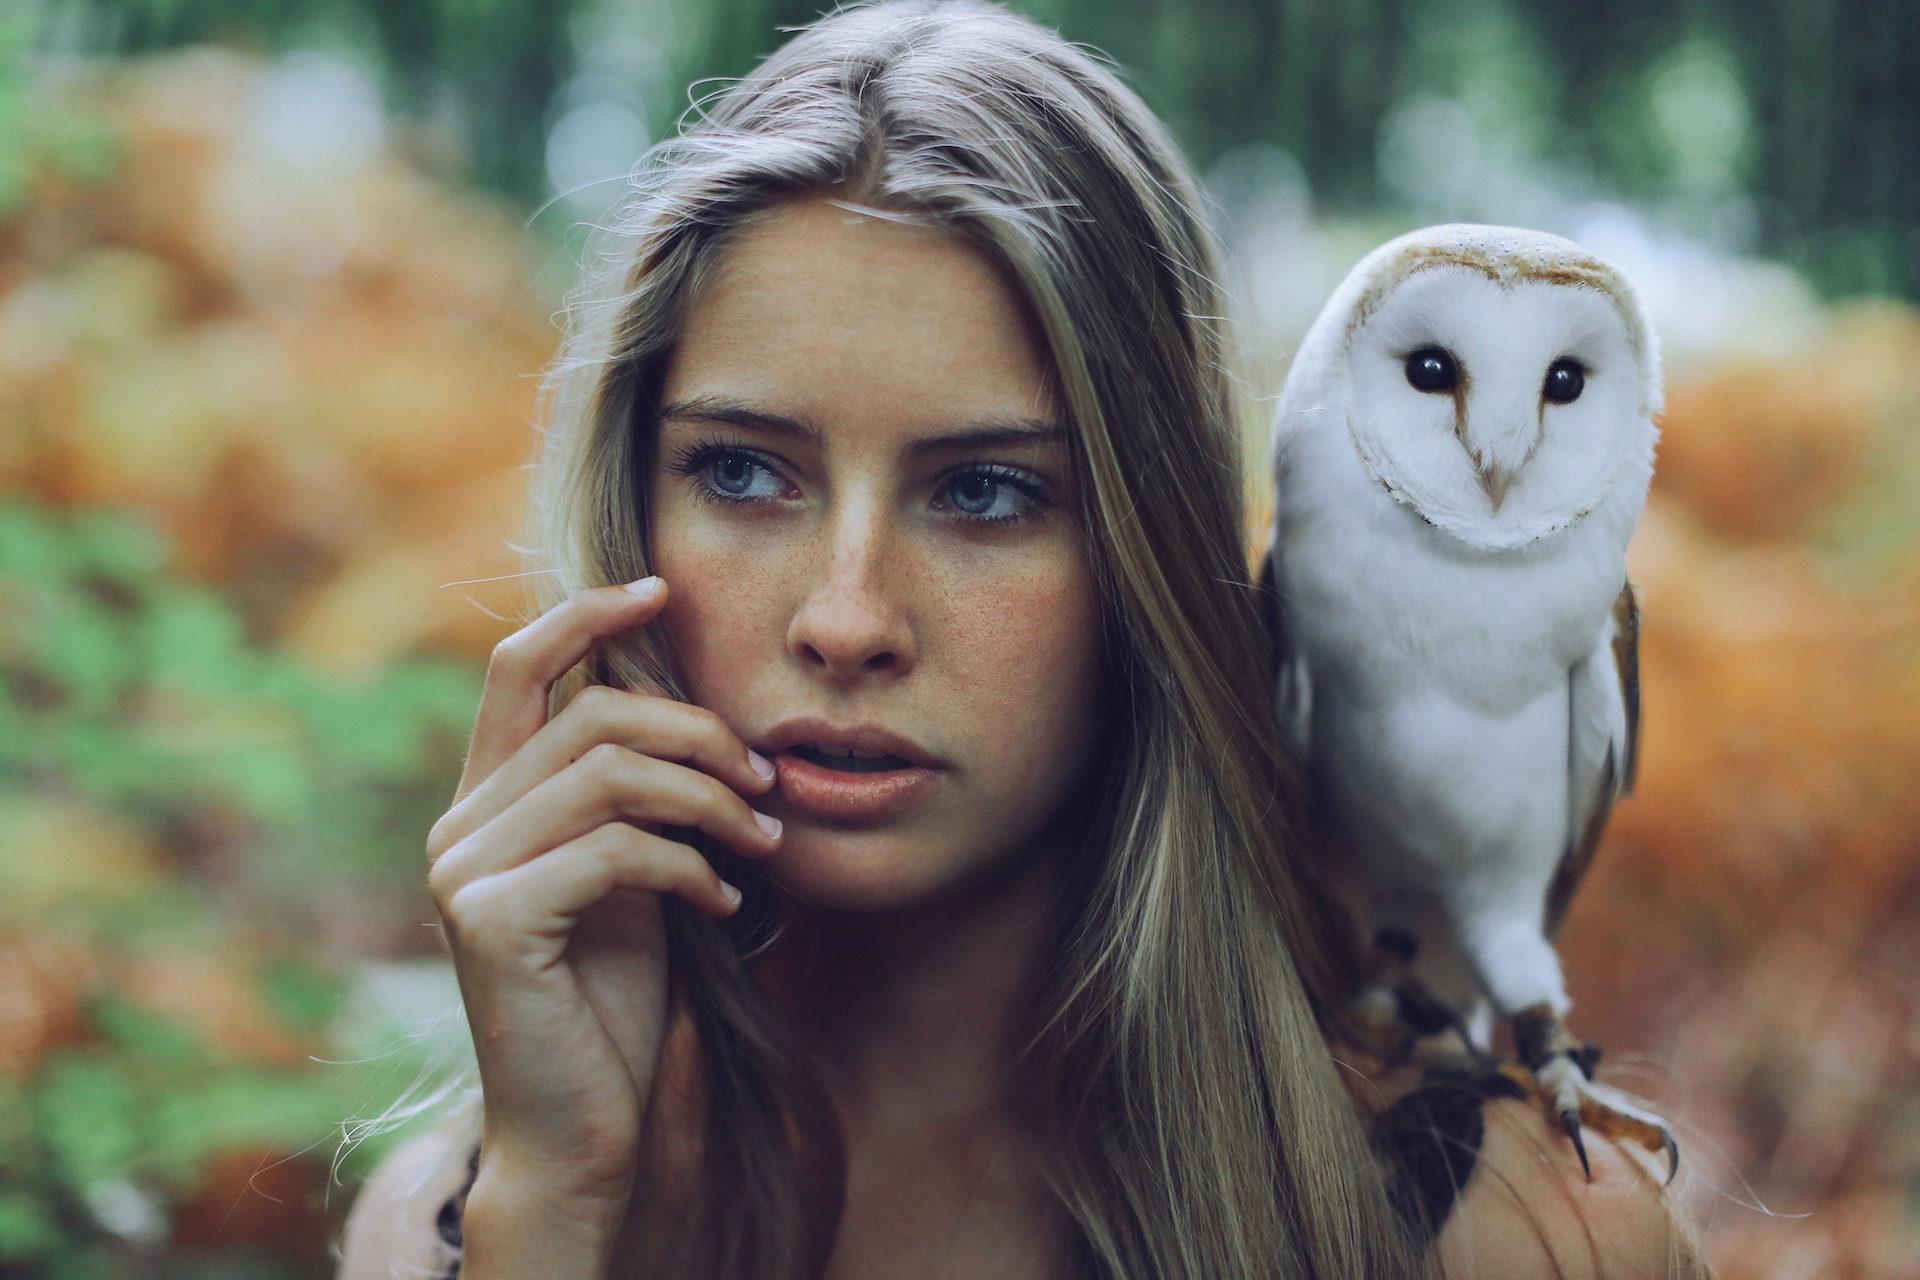 महिला, उल्लू, पक्षी, पालतू पशु, देखो - HD वॉलपेपर - प्रोफेसर-falken.com